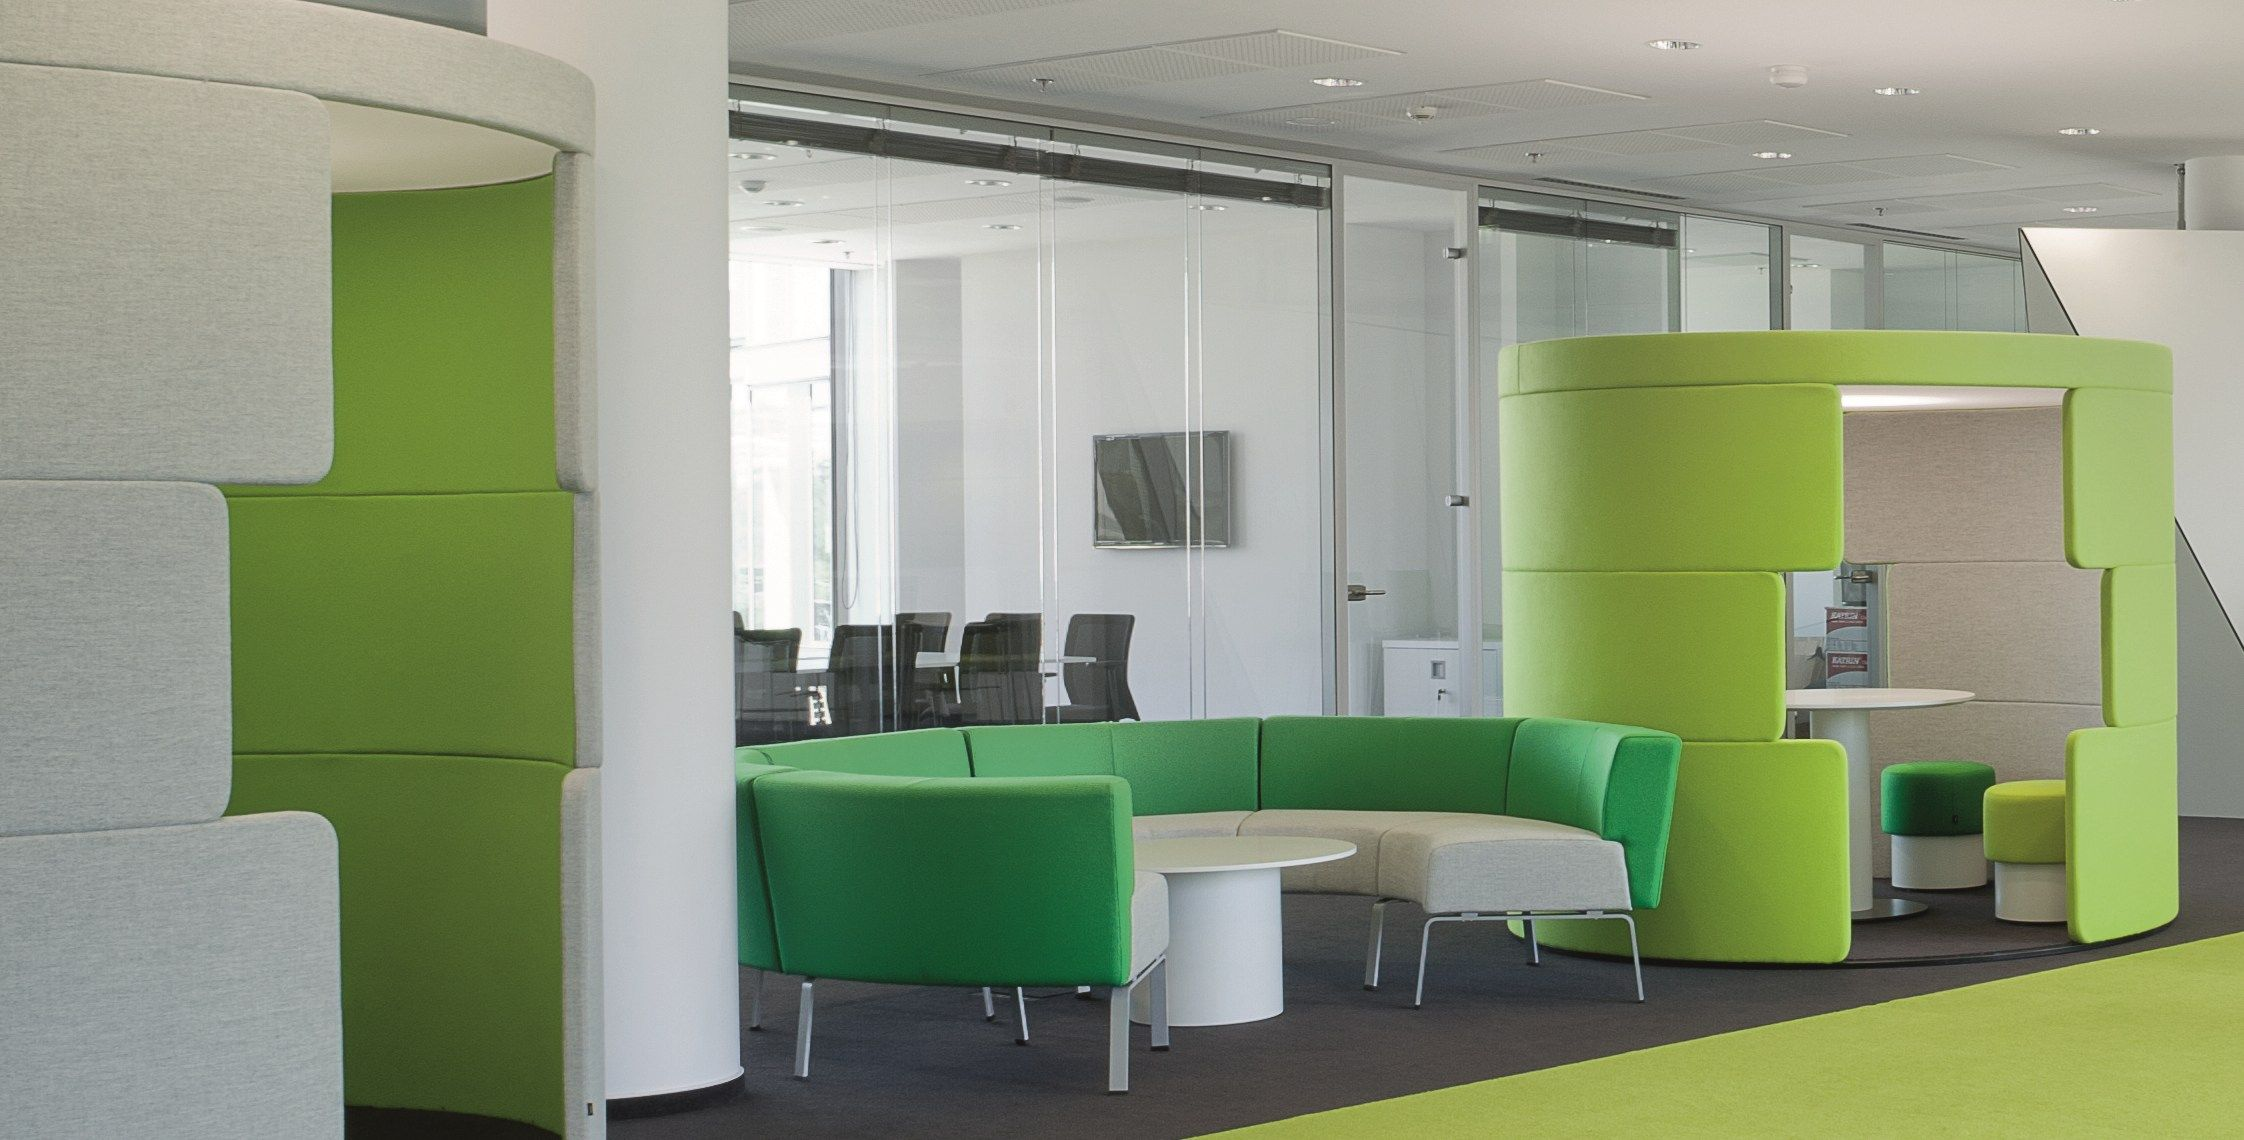 PARCS by PearsonLloyd for Bene - Bene Office Furniture   New ...